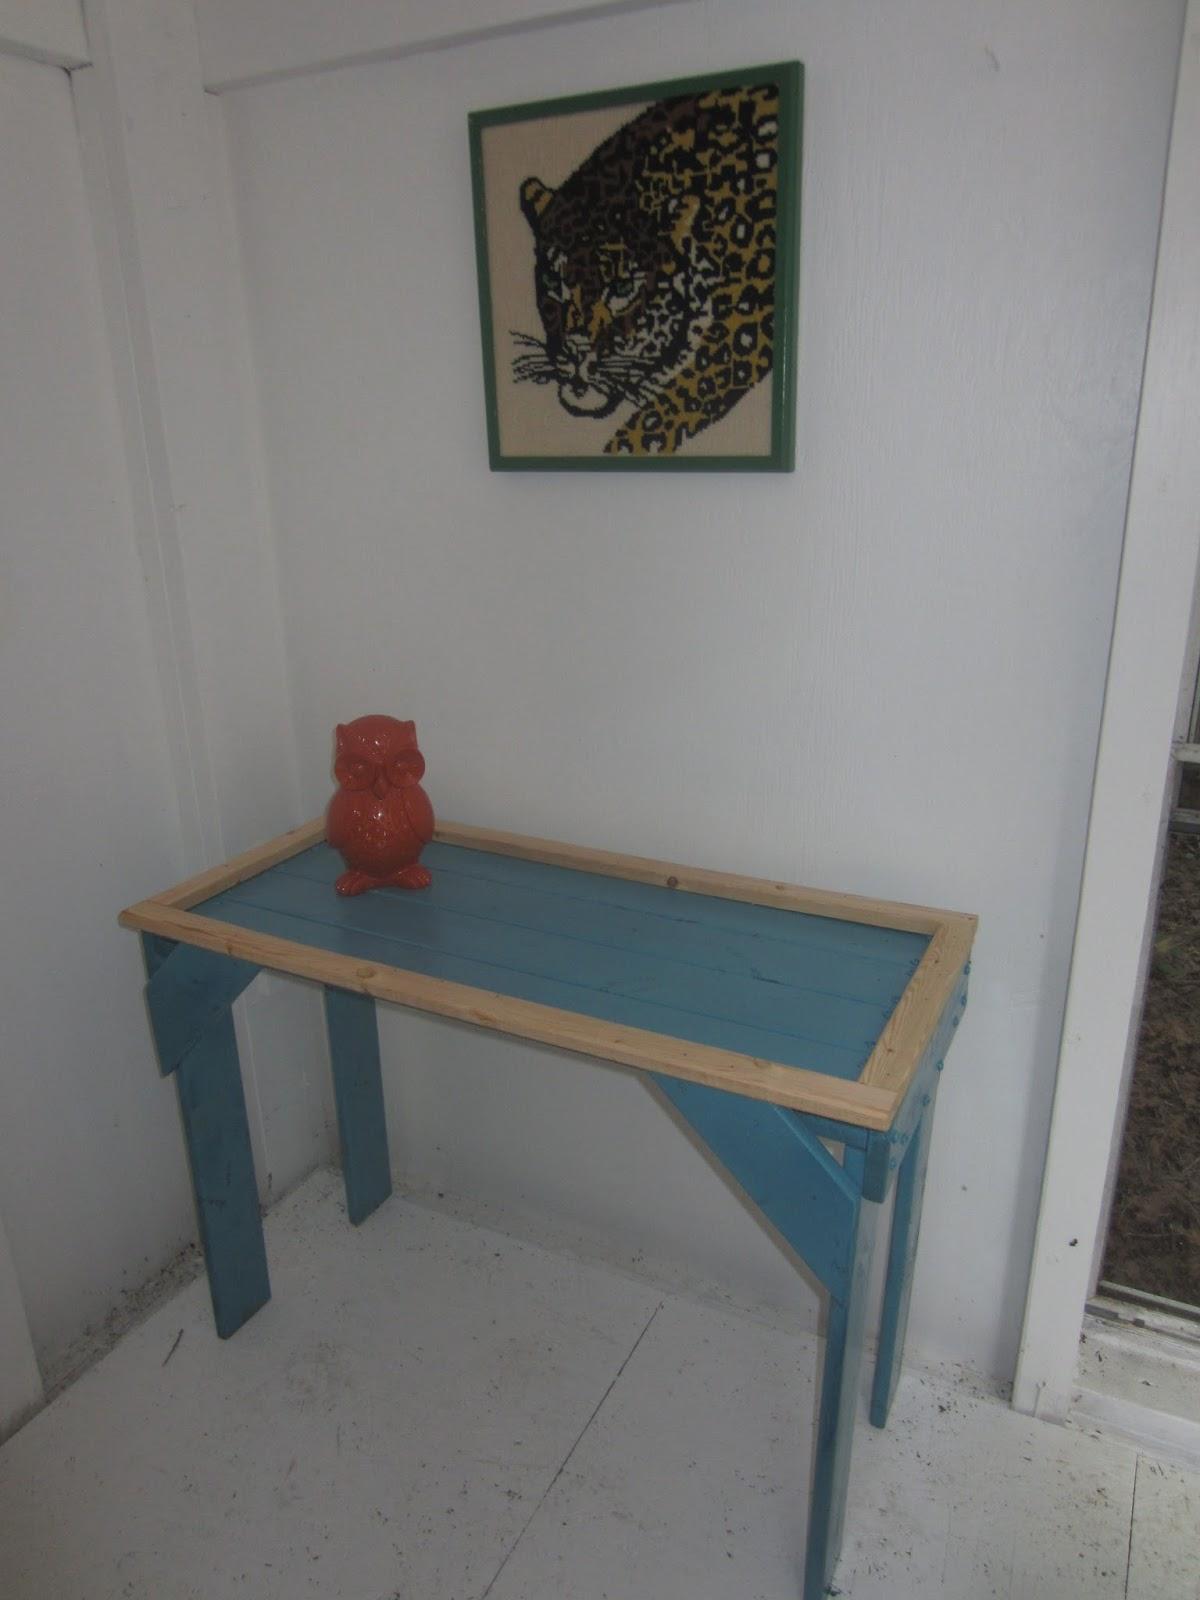 cheap sofas san antonio tx flip flop sofa ashley furniture angelo trailers craigslist autos post